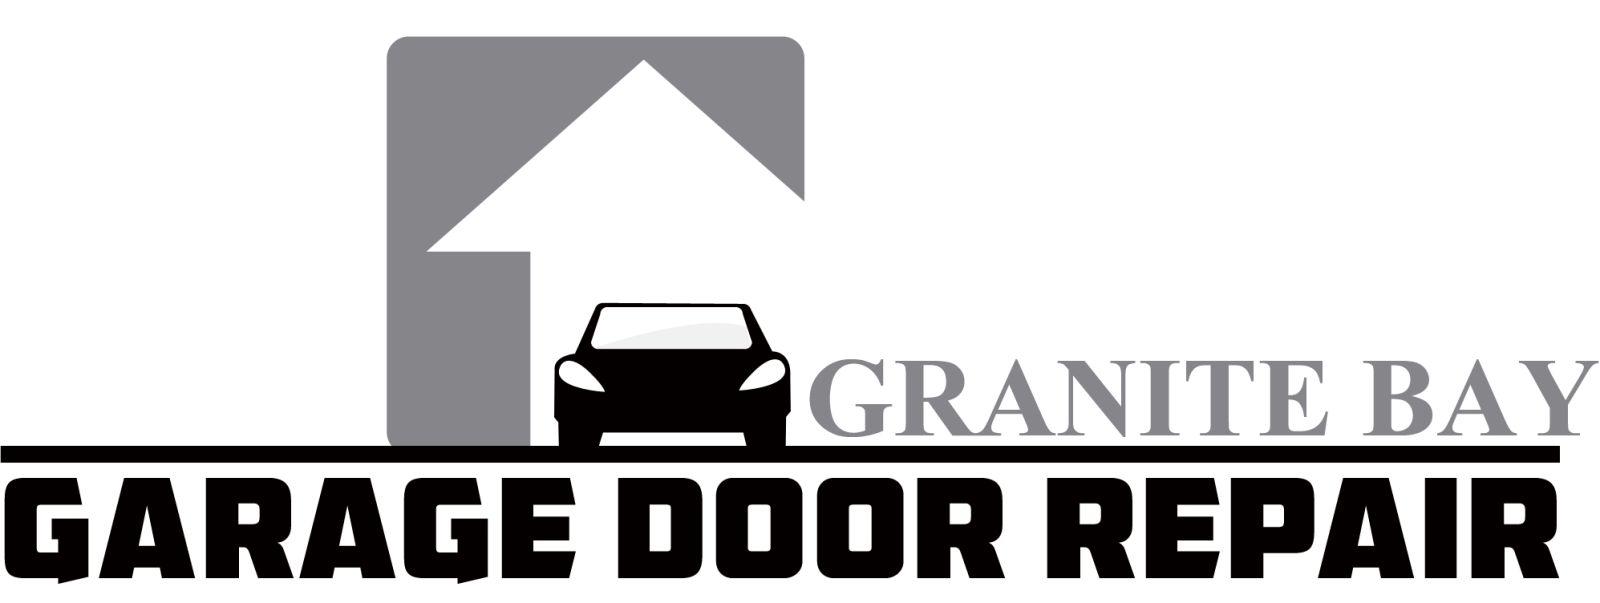 Garage Door Repair & Installation in Granite Bay, CA